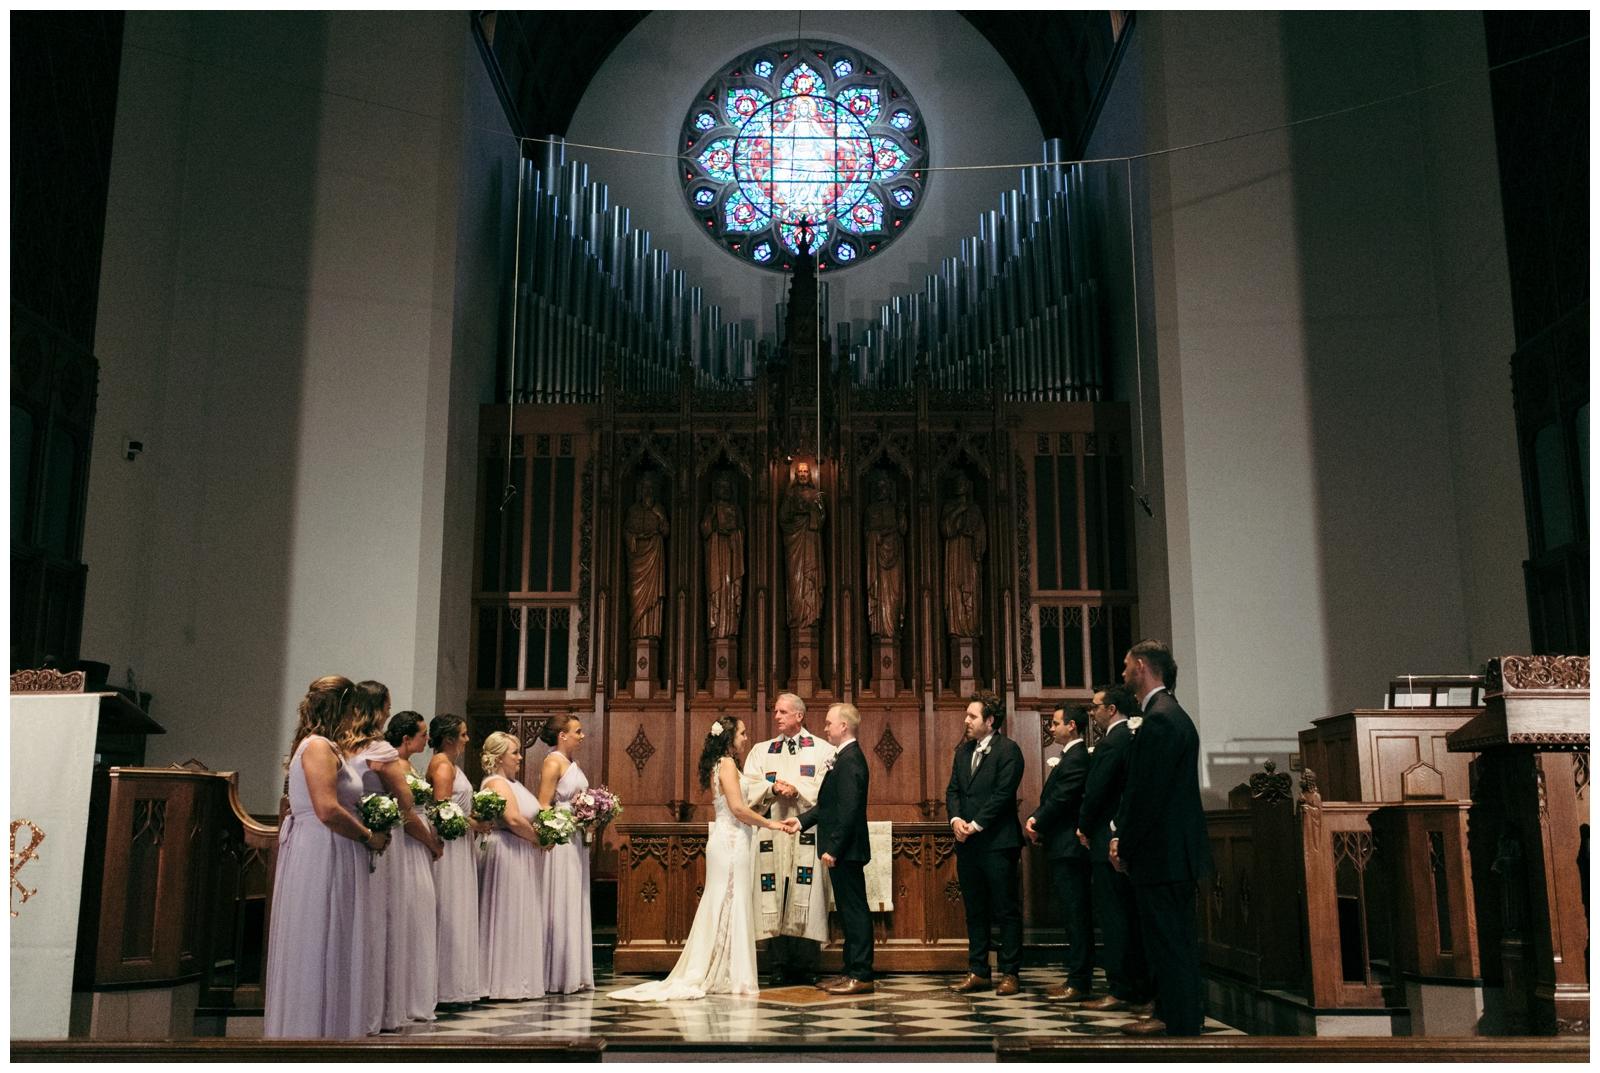 Bailey-Q-Photo-Royal-Sonesta-Boston-Wedding-Photographer-049.jpg